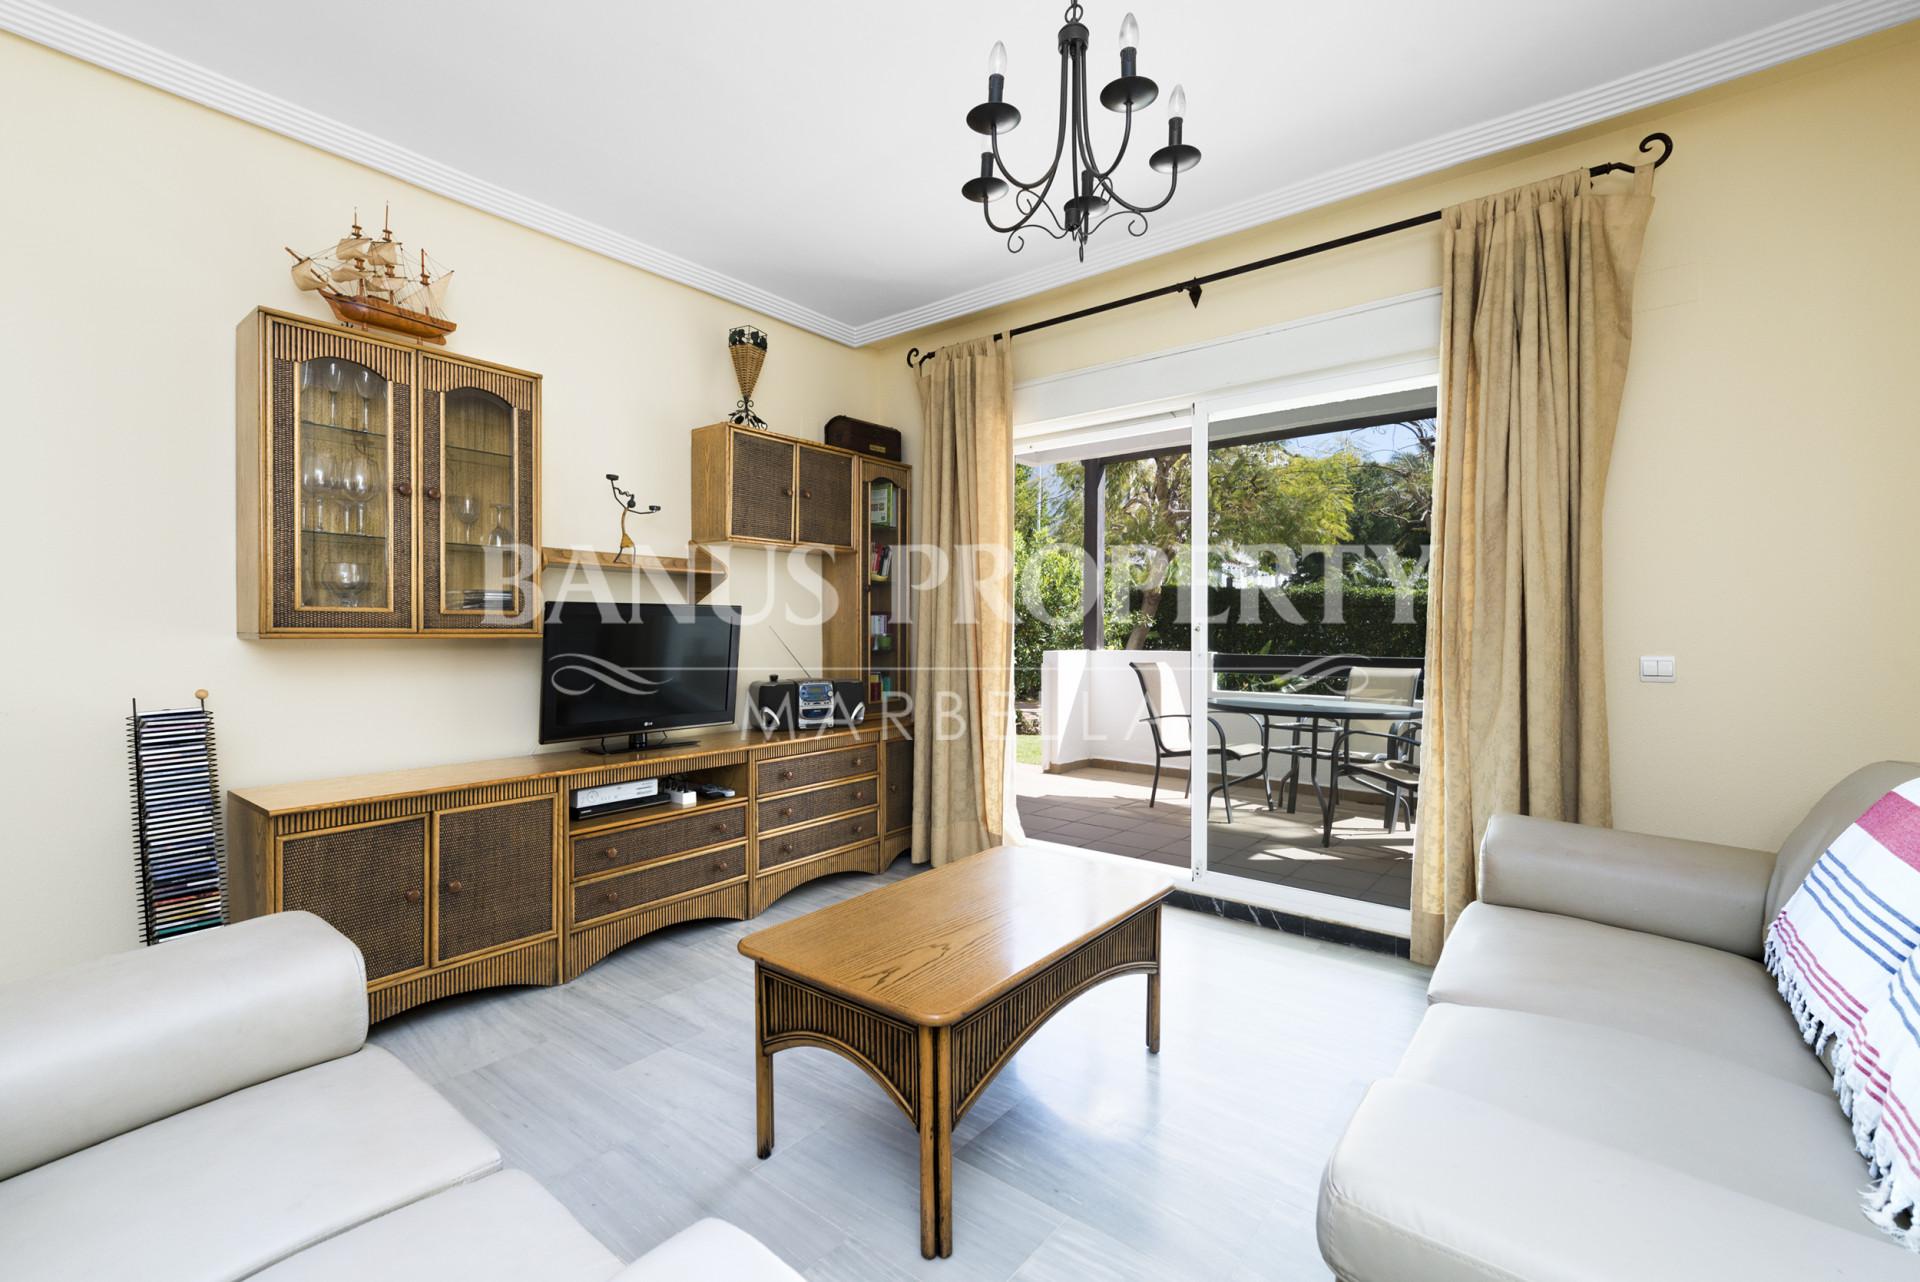 2 bedroom apartment in Medina Garden - Puerto Banús